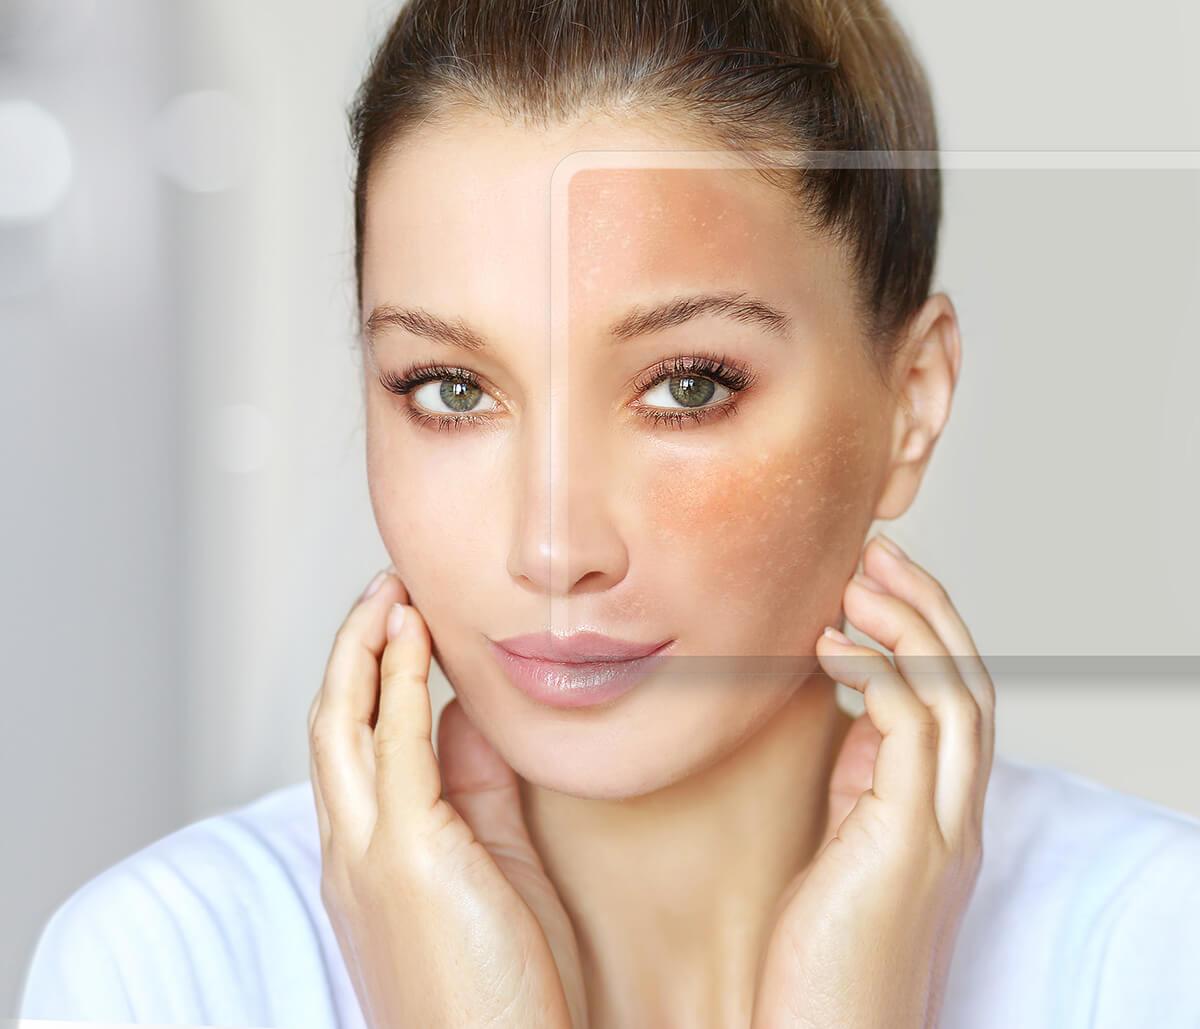 Removal of Brown Spots at California Skin & Laser Center in Stockton Area